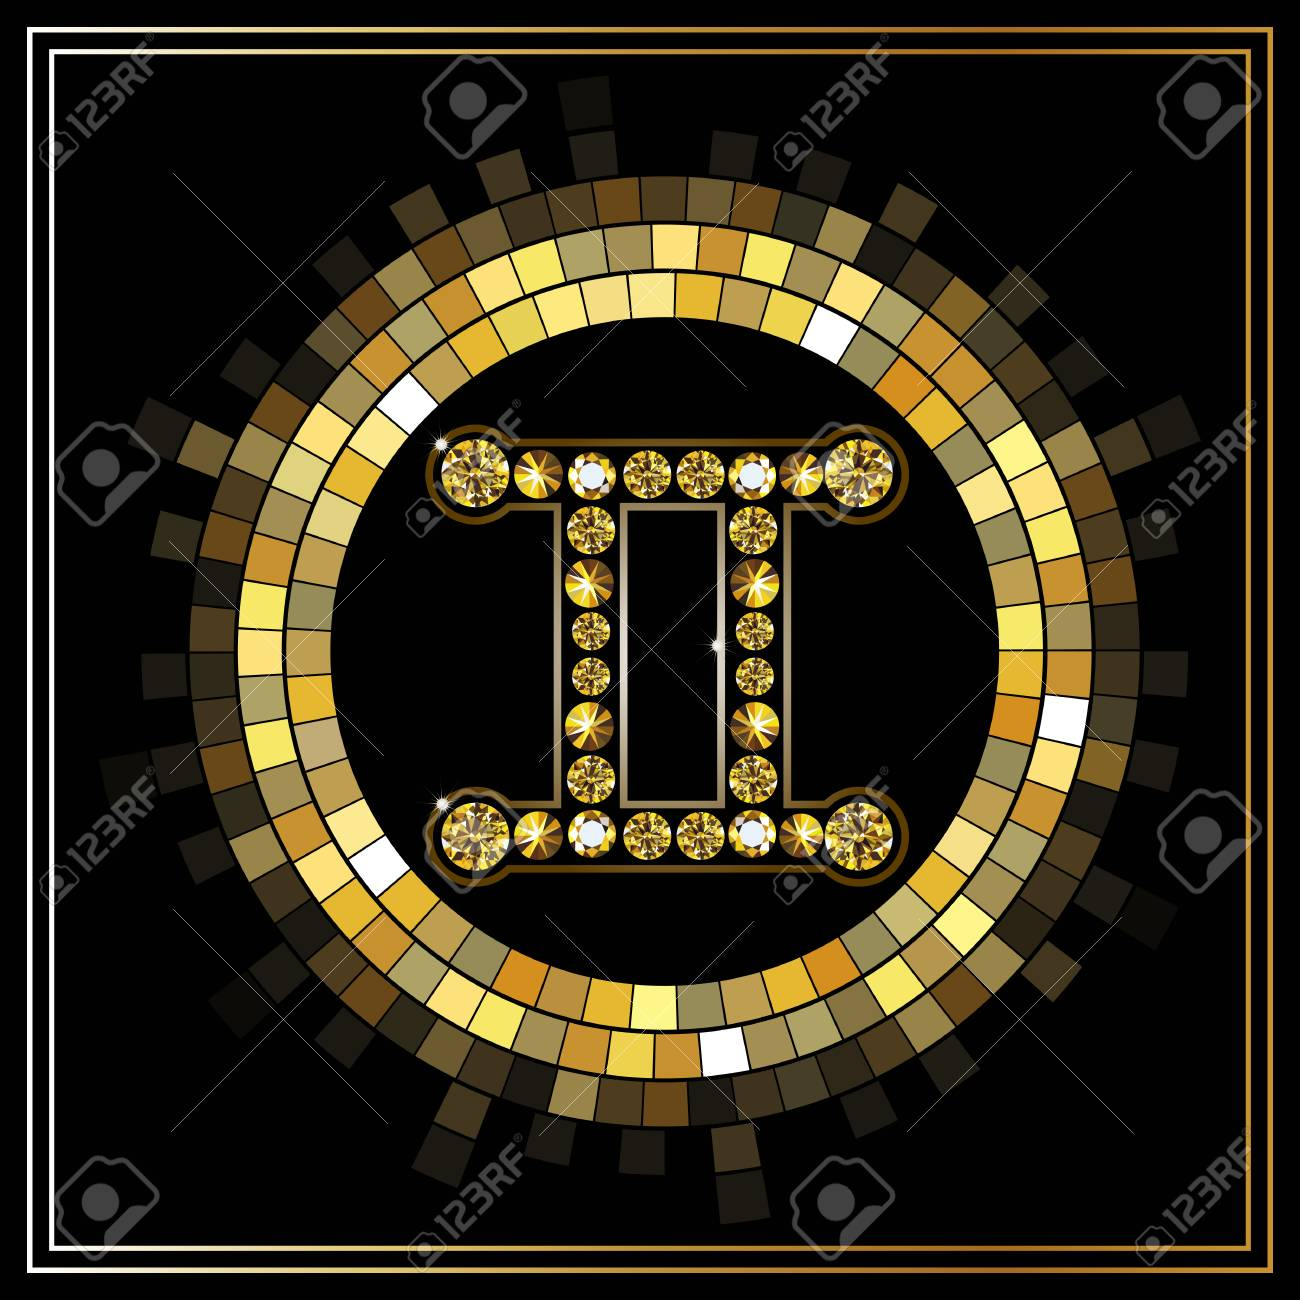 Decorative Zodiac Sign Gemini Horoscope And Astrology Astronomy Symbol Stock Vector